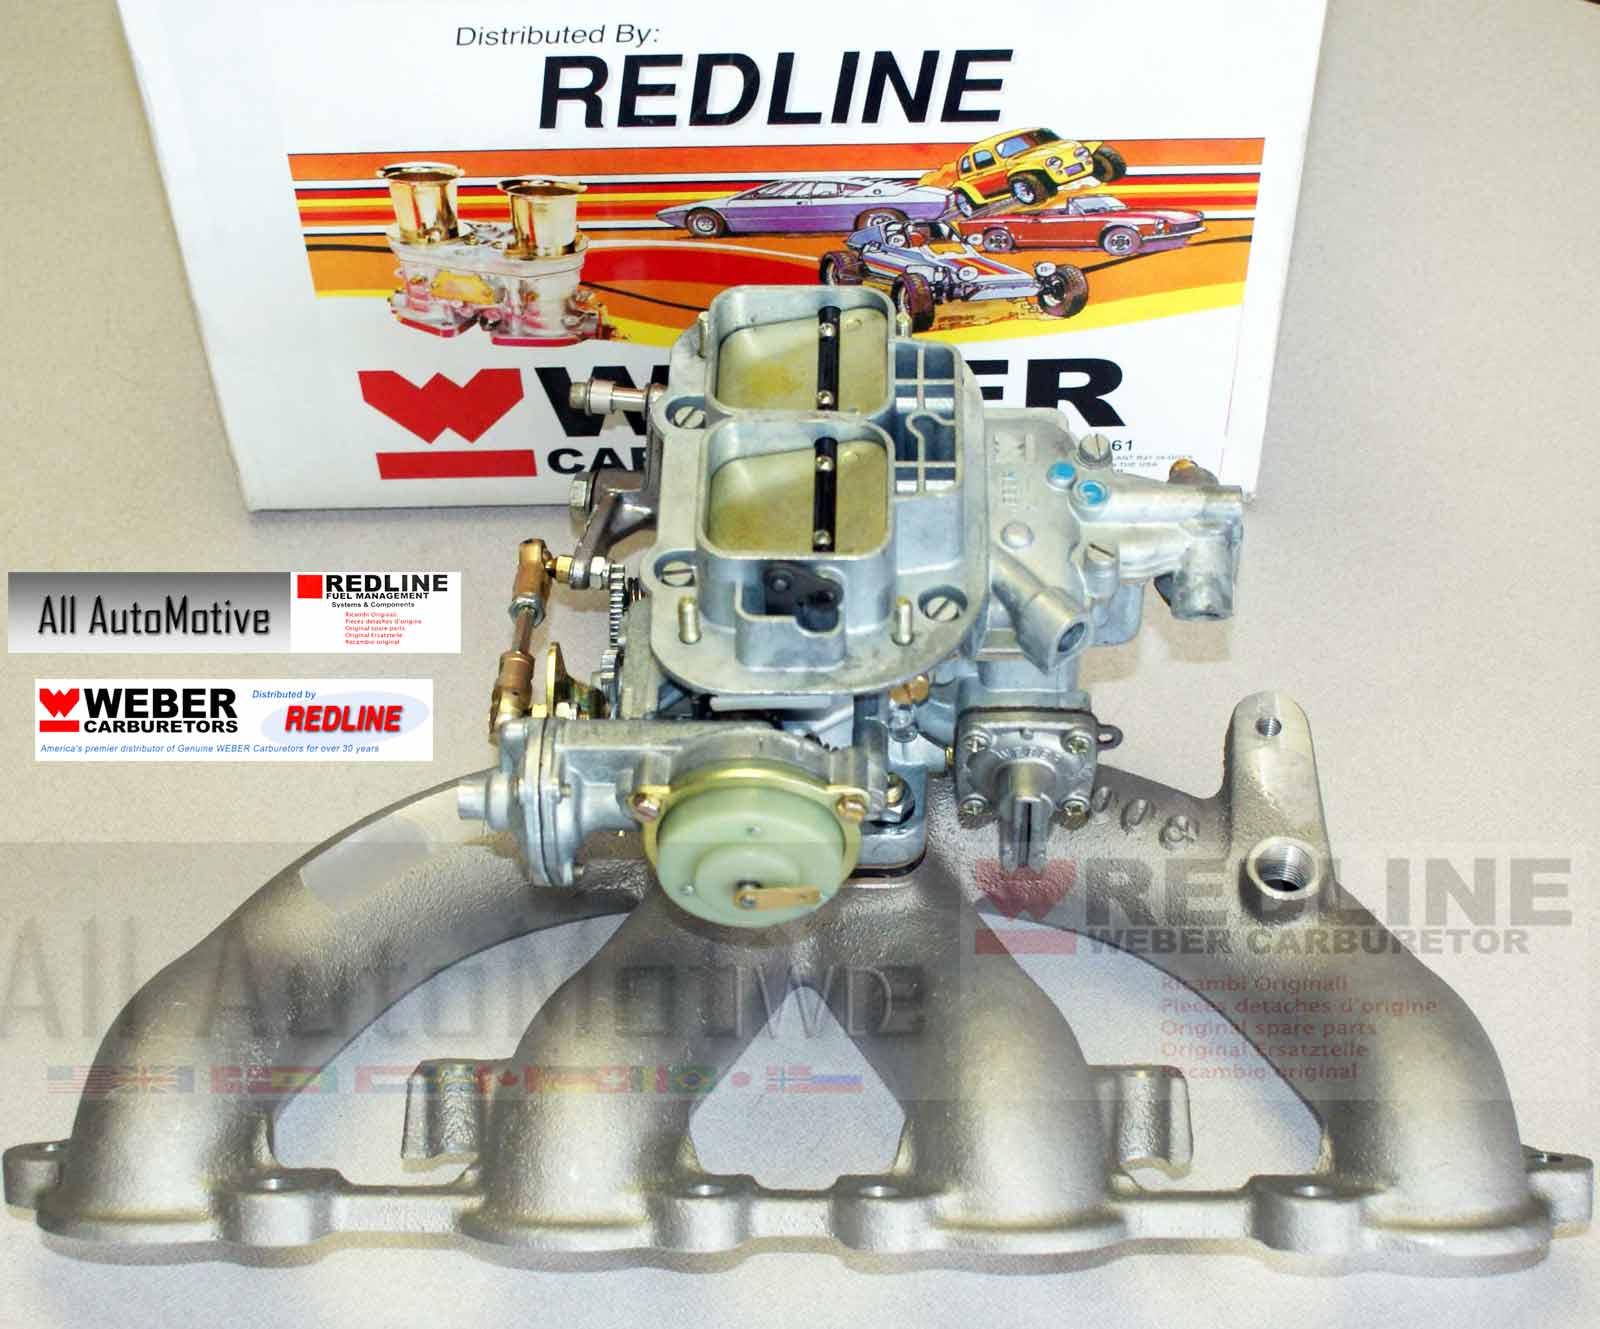 Details About Volvo Penta Carburetor Aq125 Aq145 Aq131 Weber Conversion W Manifold Aq130c Engine Diagram Ebay